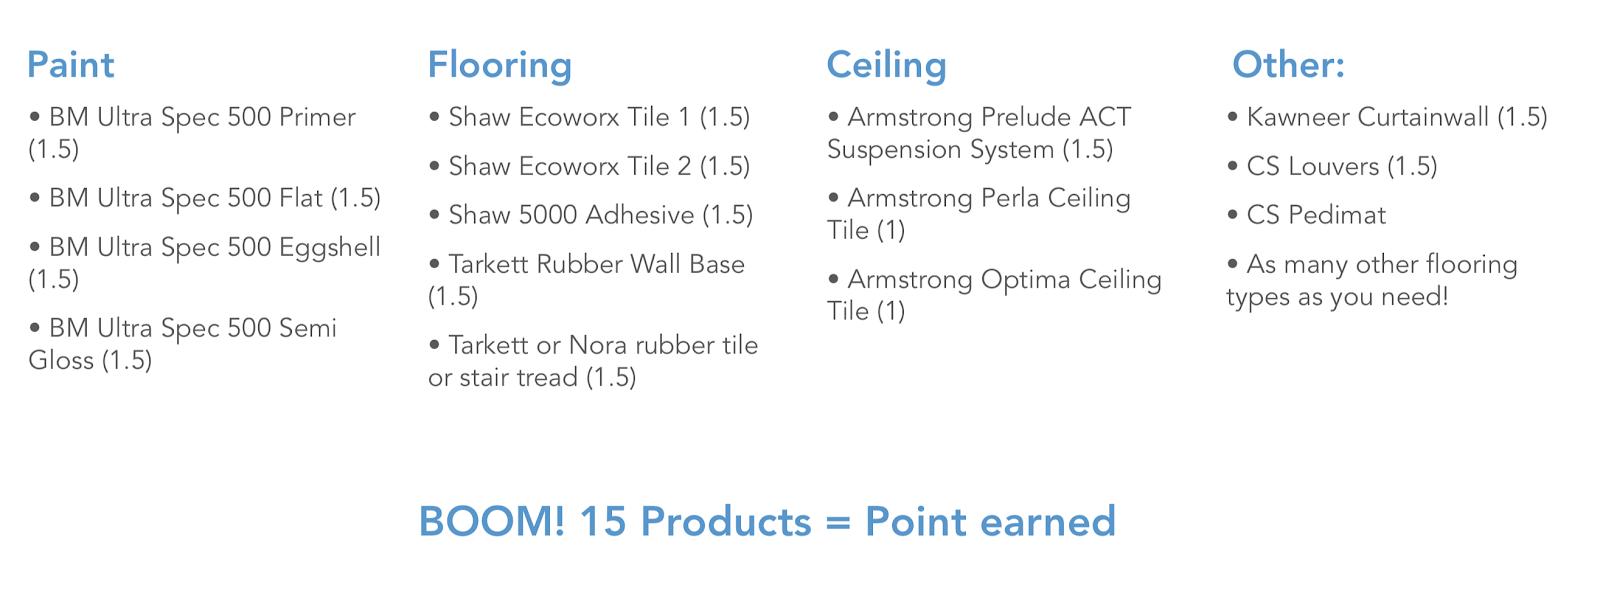 mrc4-option2-product-categories